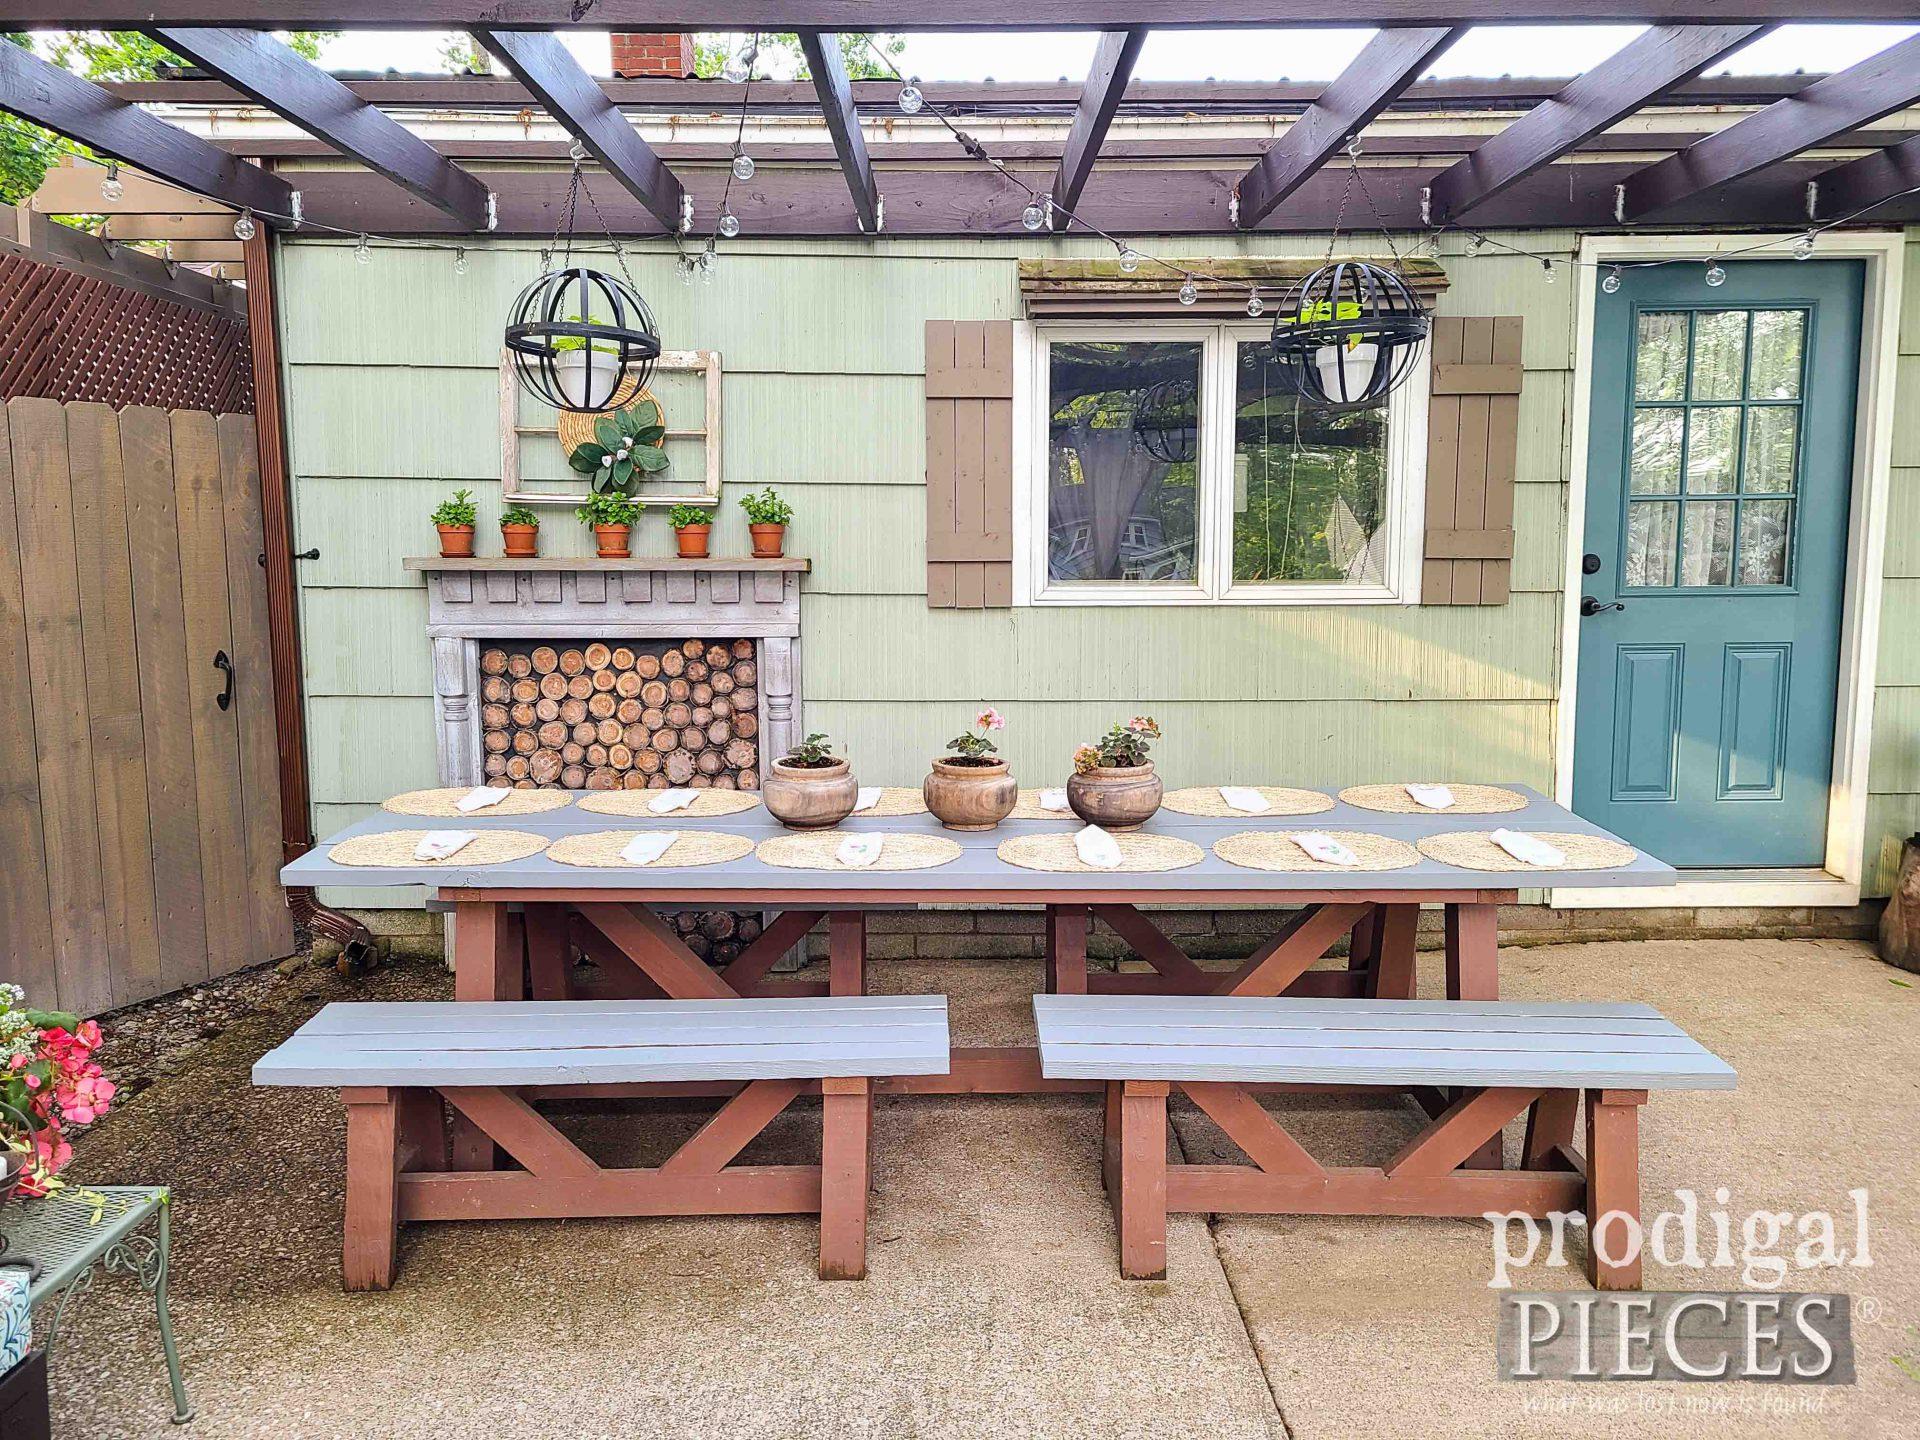 DIY Patio Picnic Dining Table by Larissa of Prodigal Pieces | prodigalpieces.com #prodigalpieces #patio #diy #home